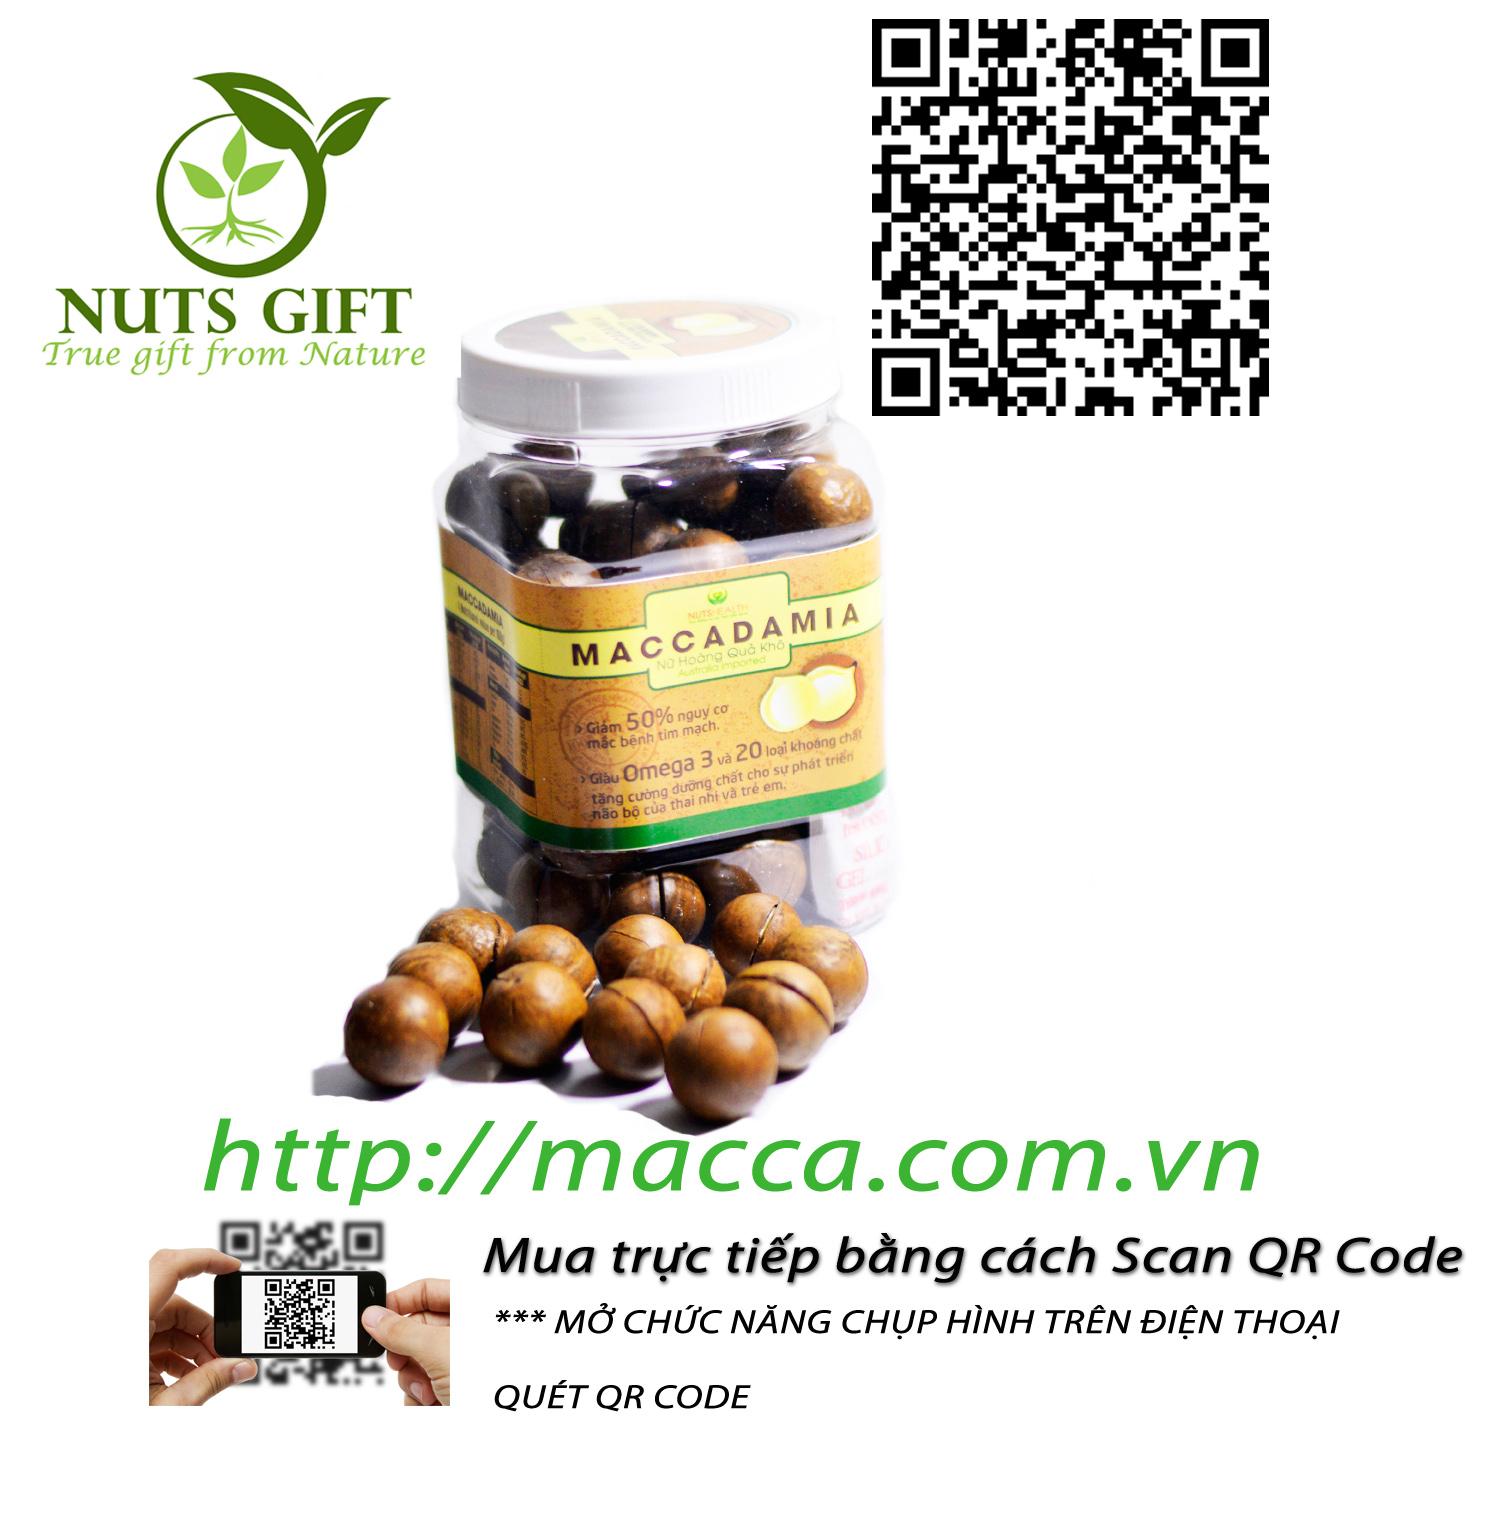 HẠT MẮC CA MACCA ÚC – NUTSHEALTH – 500 GR